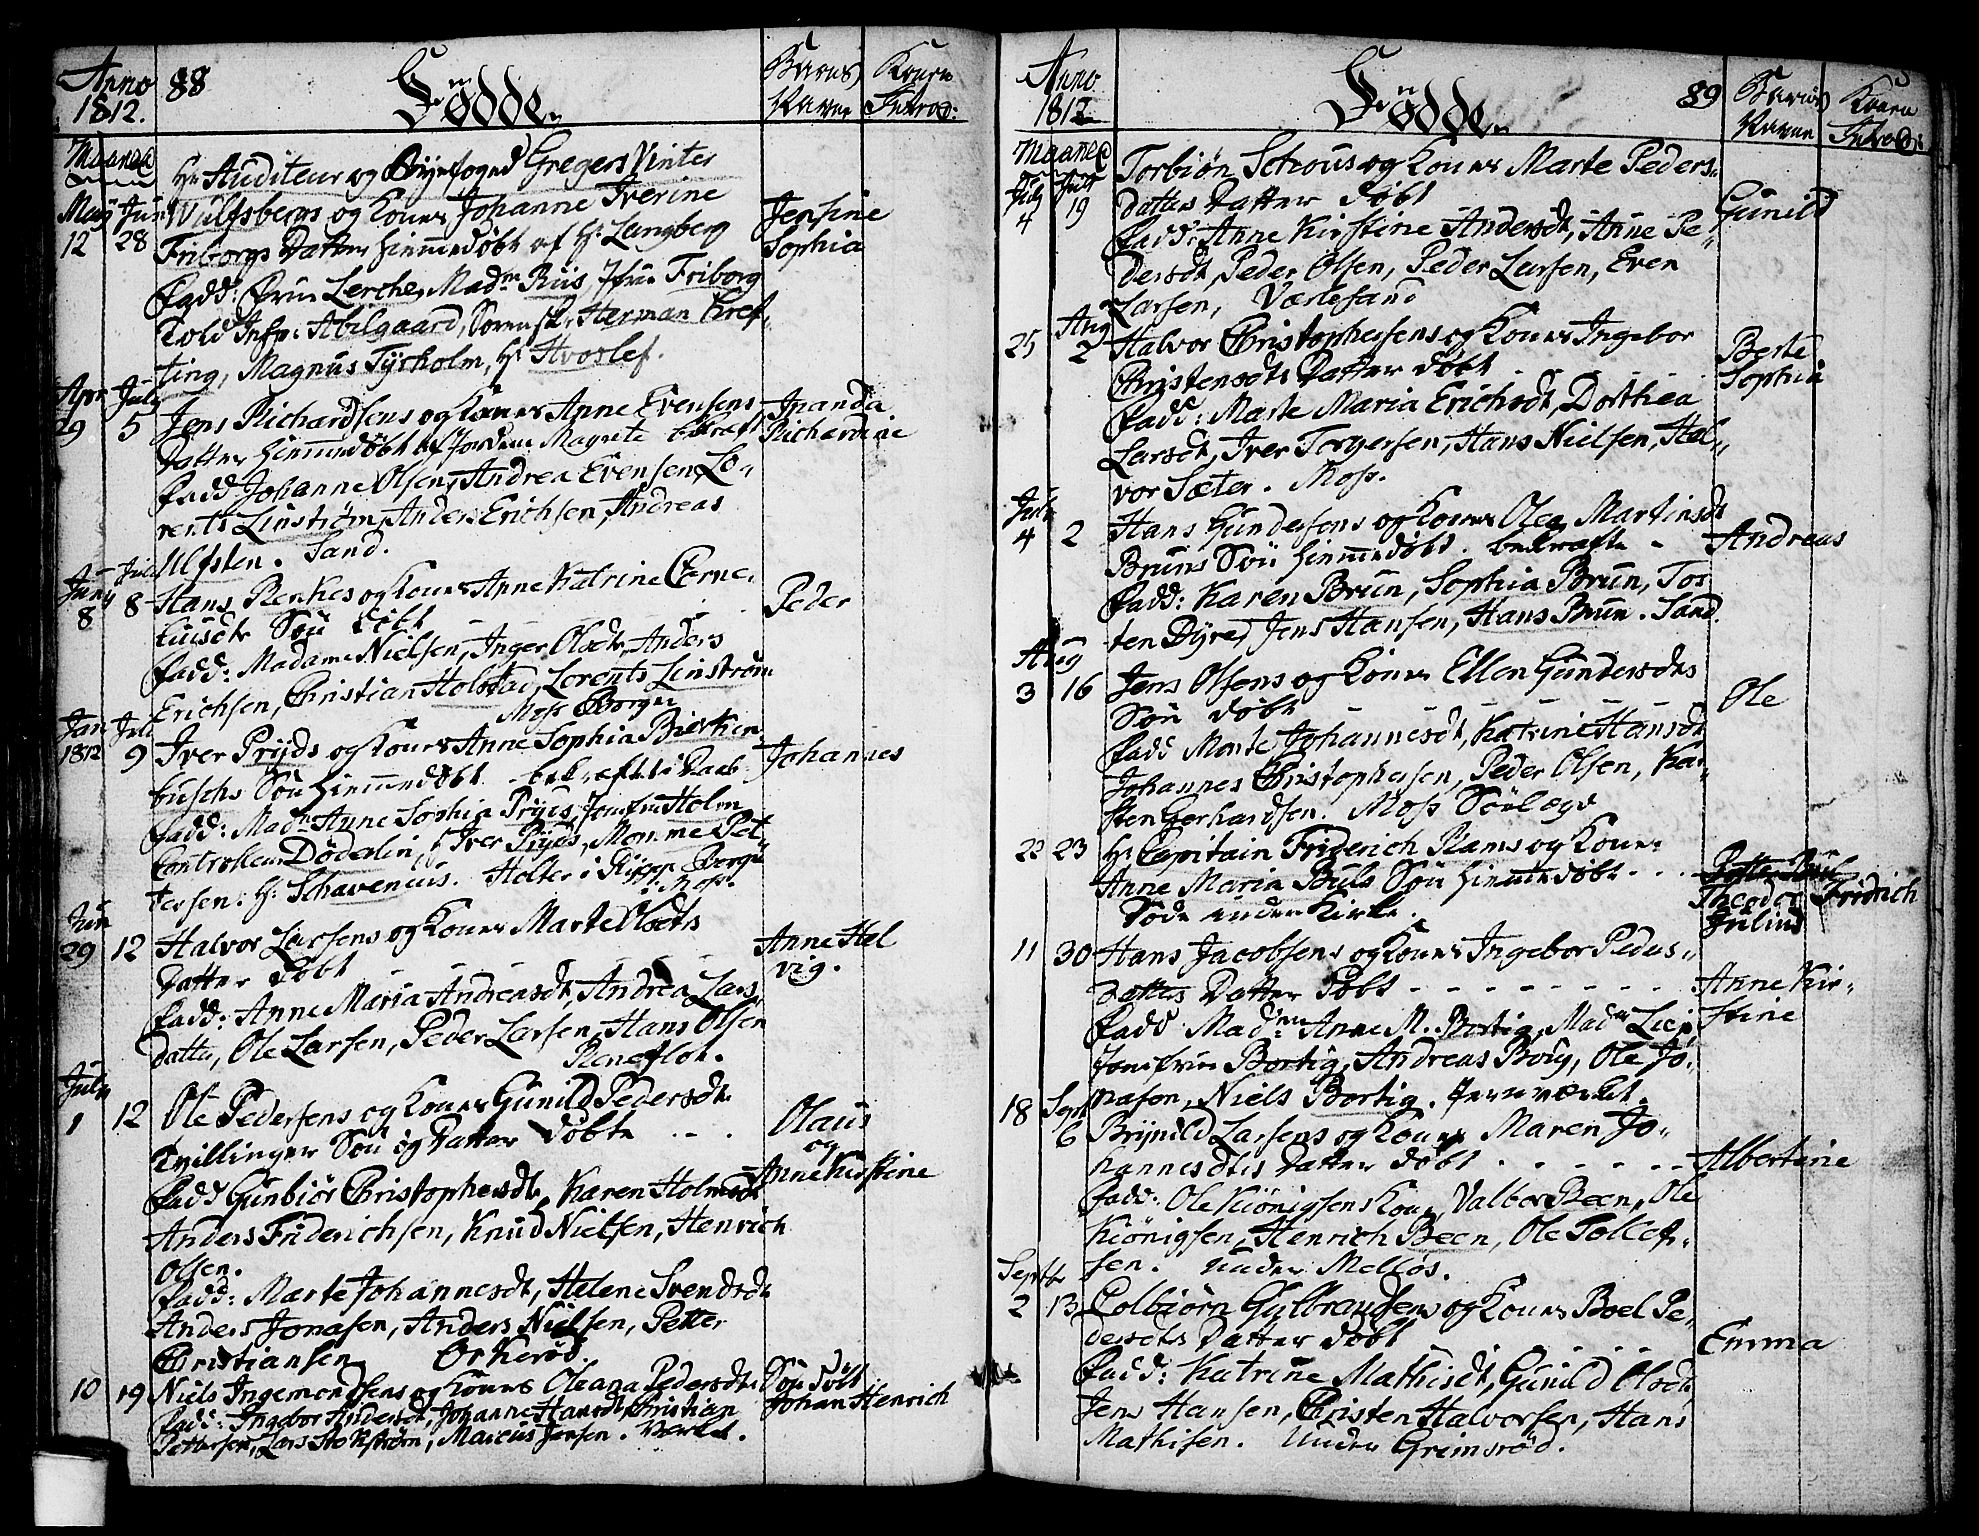 SAO, Moss prestekontor Kirkebøker, F/Fa/Faa/L0003: Ministerialbok nr. I 3, 1779-1814, s. 88-89